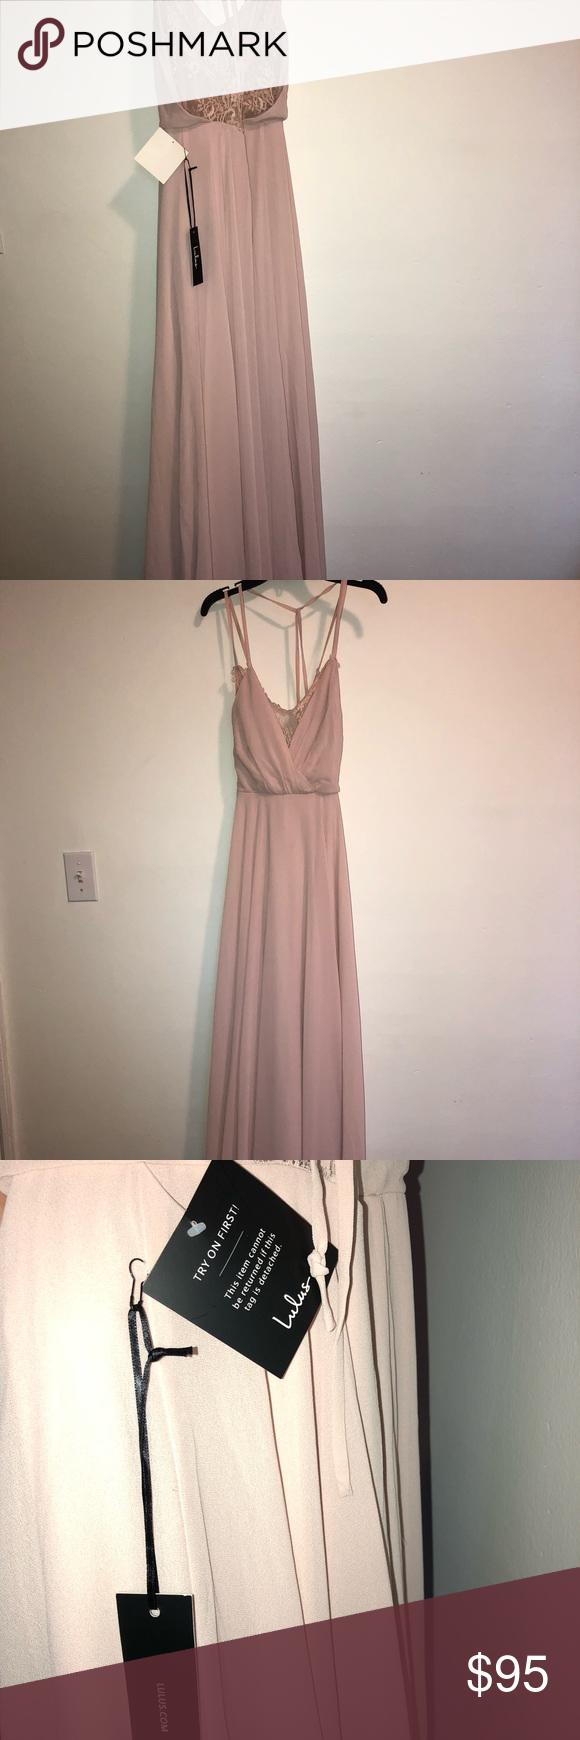 Luluus maxi dress lulus maxi dress maxi dresses and layering